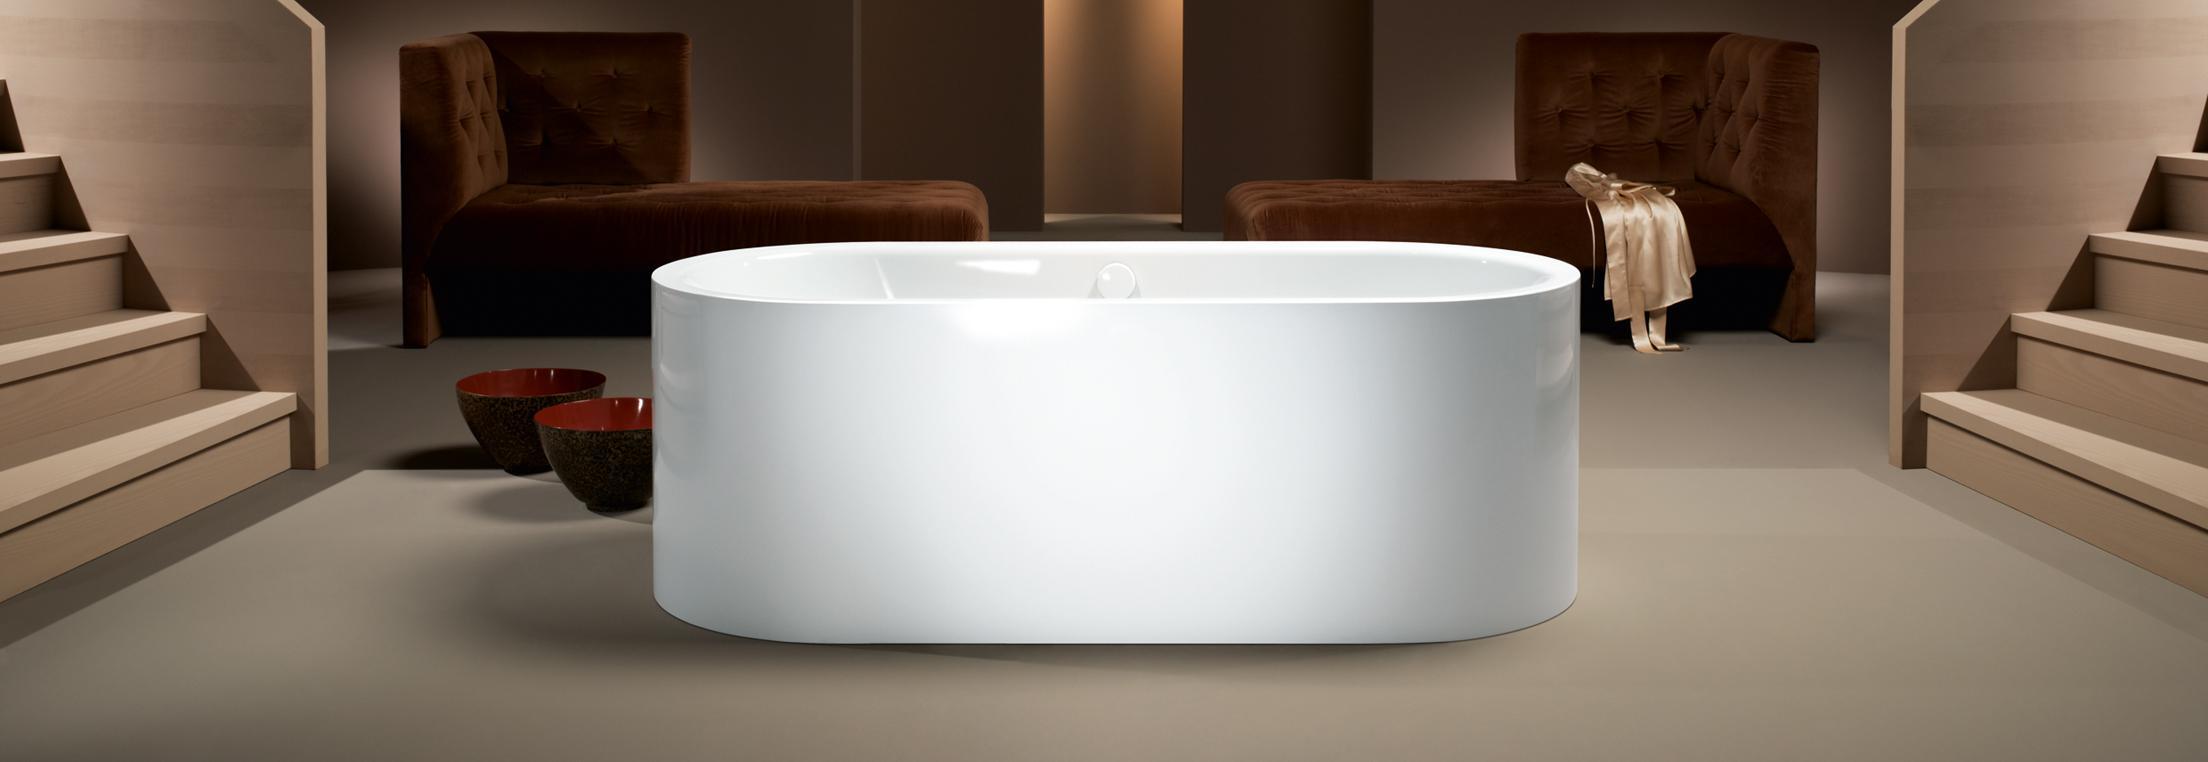 Meisterstück Centro Duo Oval - Winner Bath & Wellness